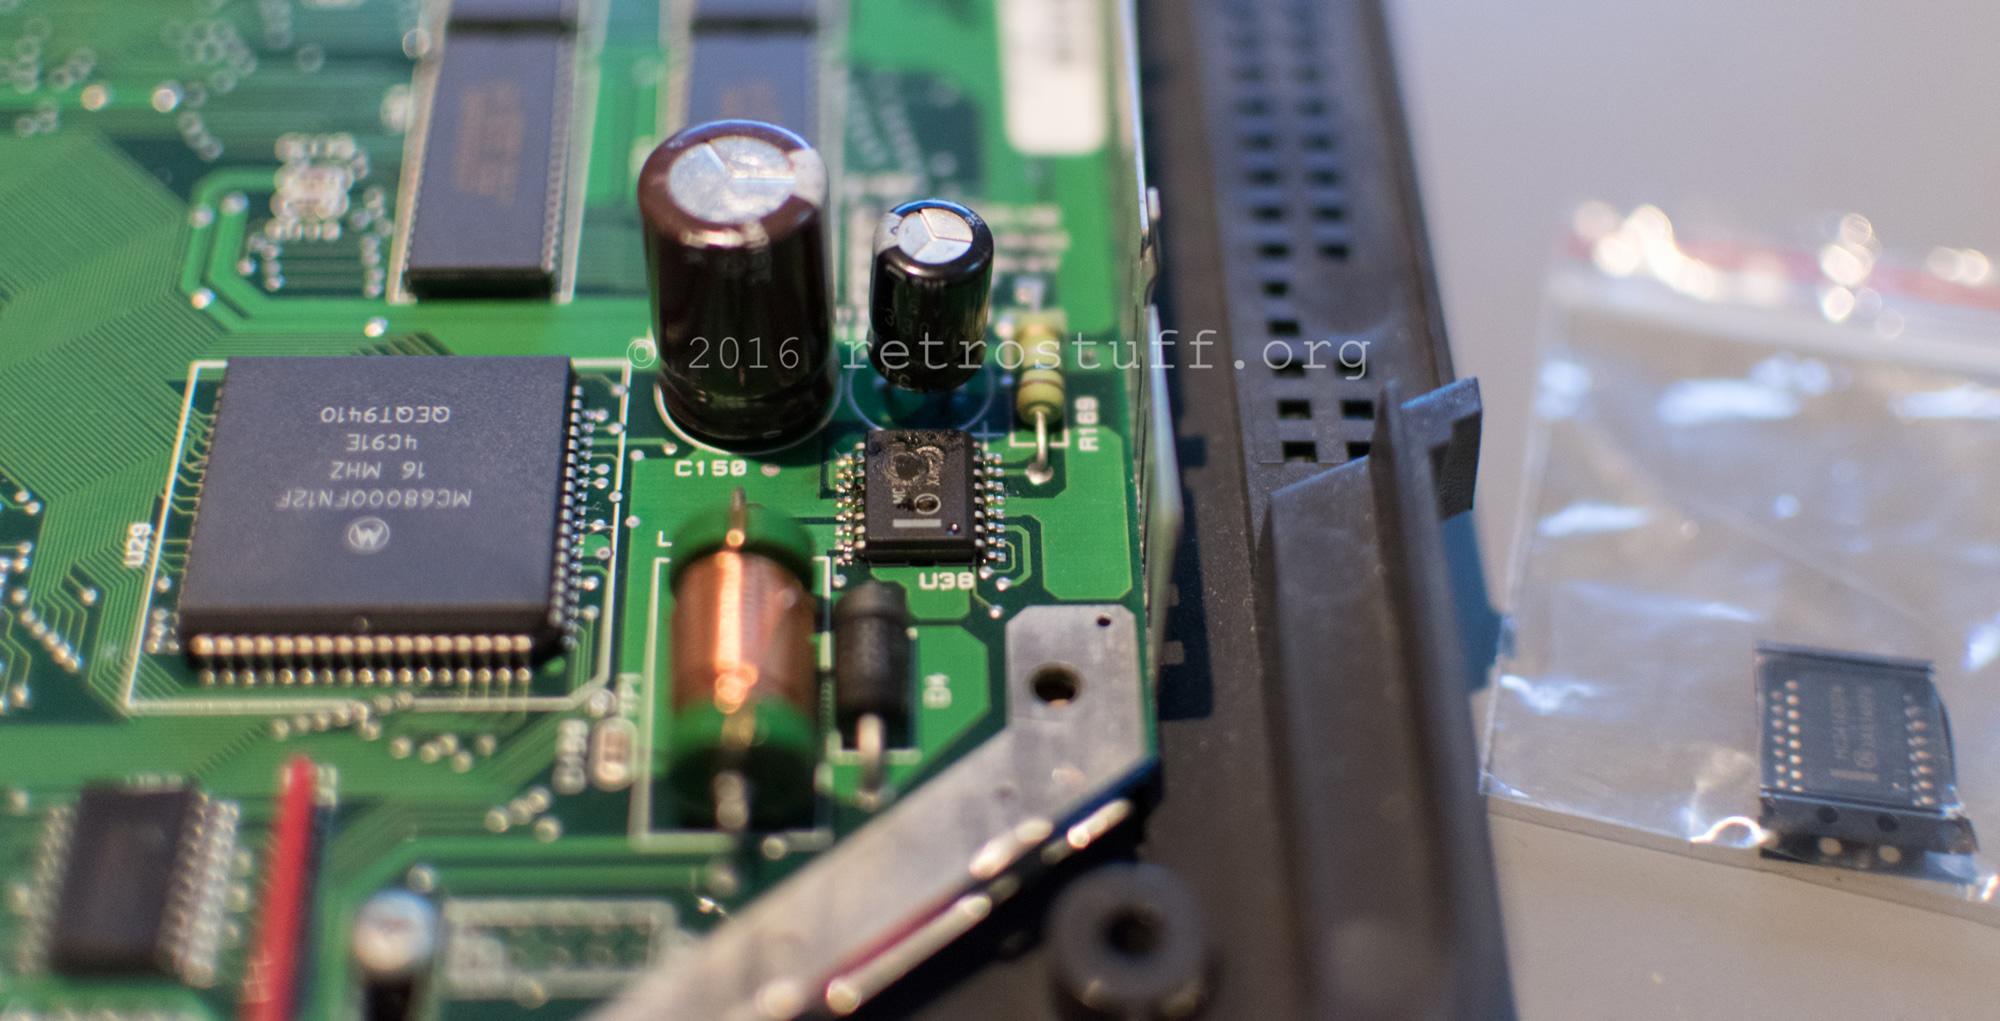 jaguar_repair_01 Xbox E Power Supply Fuse on 110v power supply, purchase xbox power supply, xbox power converter, xbox one power plug, xbox one power supply specs, xbox power box, 12v ac power supply, xbox power source, console power supply, xbox one power supply 240,